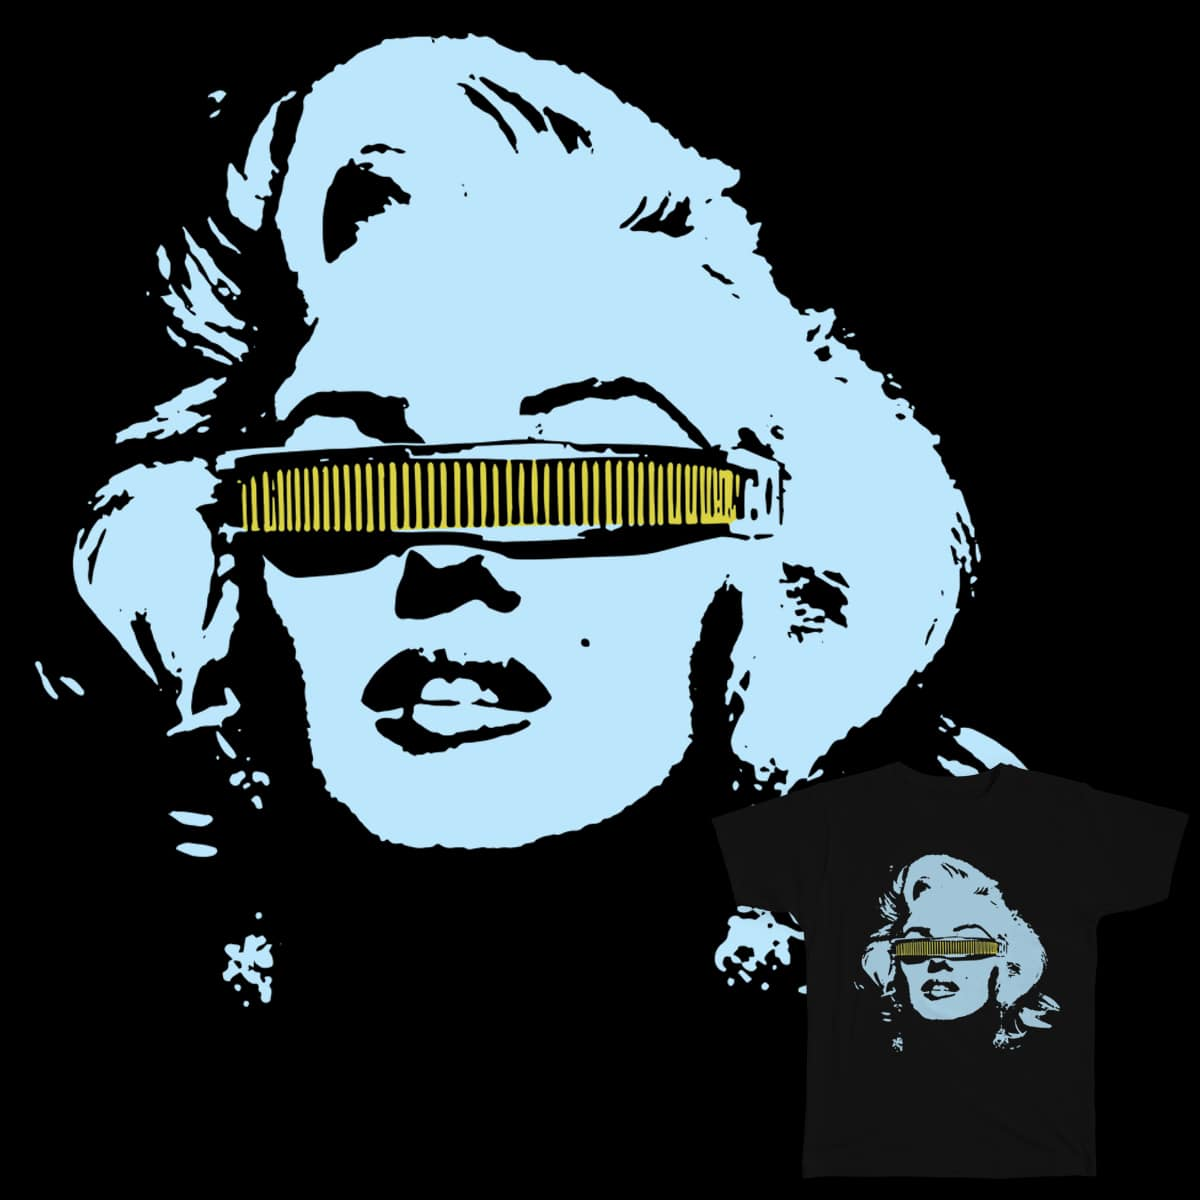 Marilyn La Forge by abalosie on Threadless